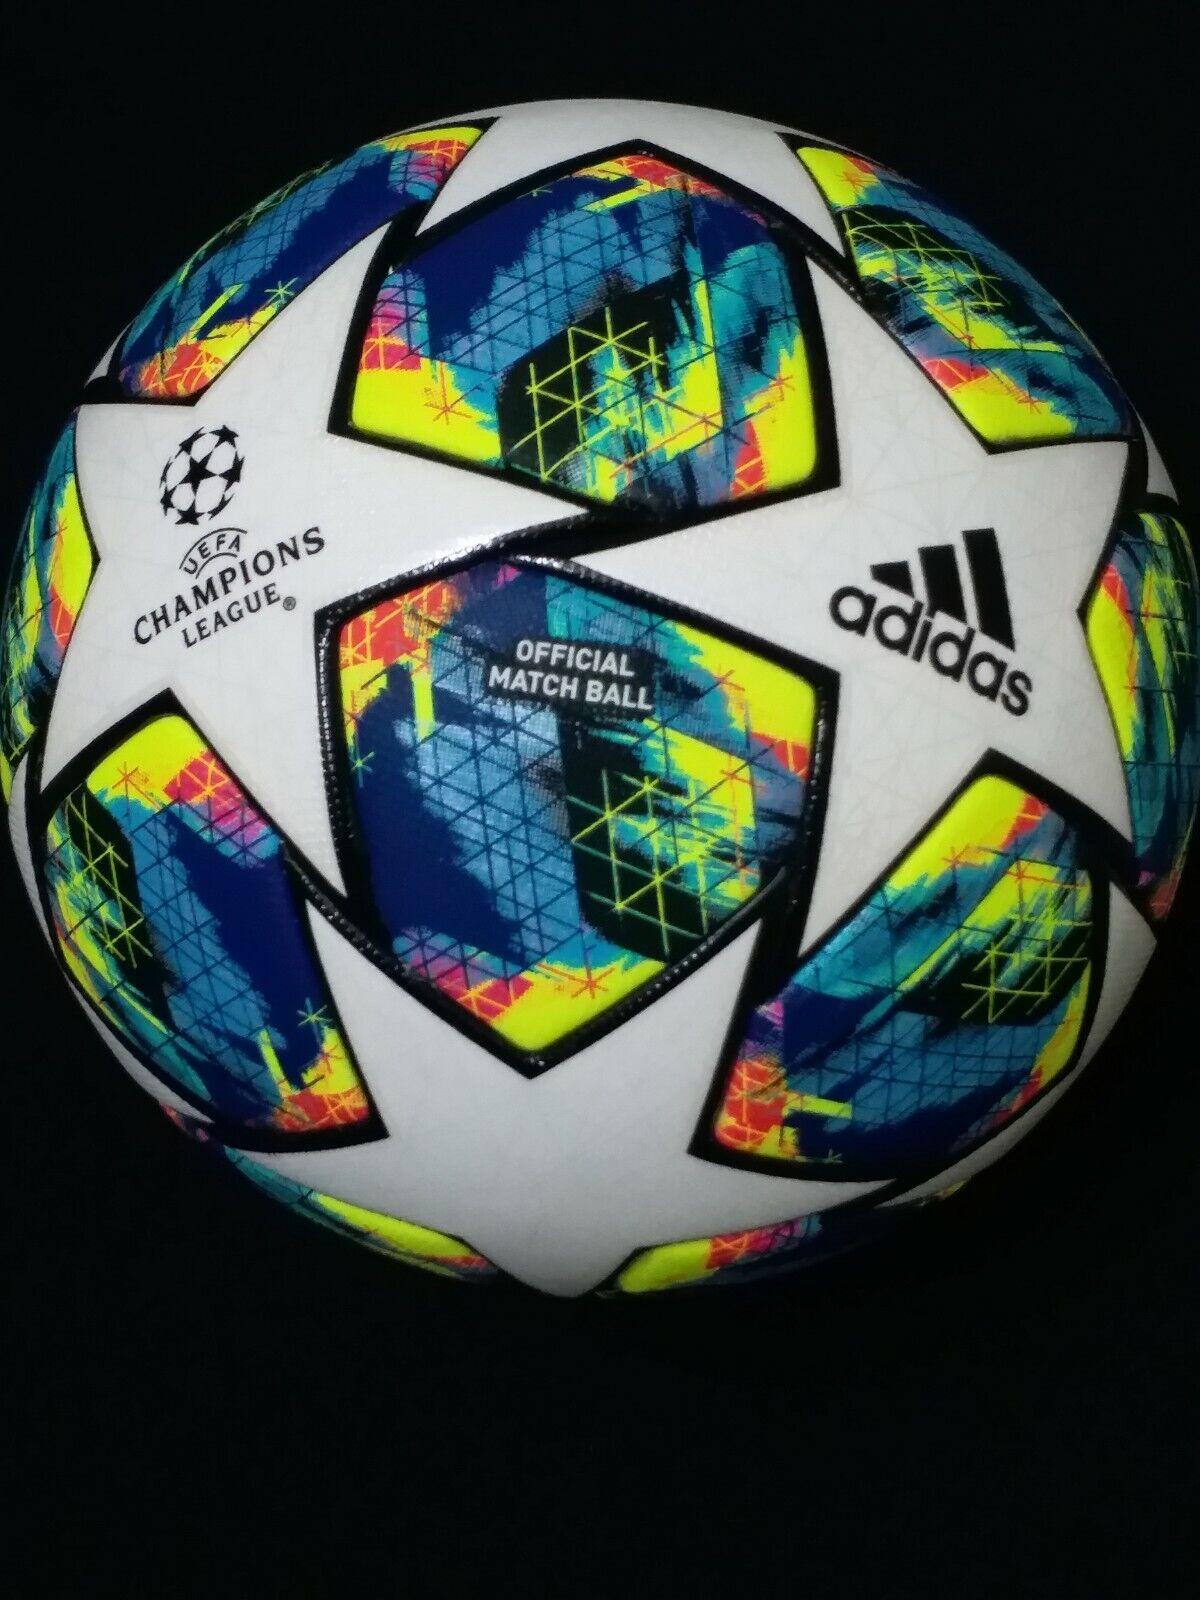 13+ Uefa Champions League Ball 2019